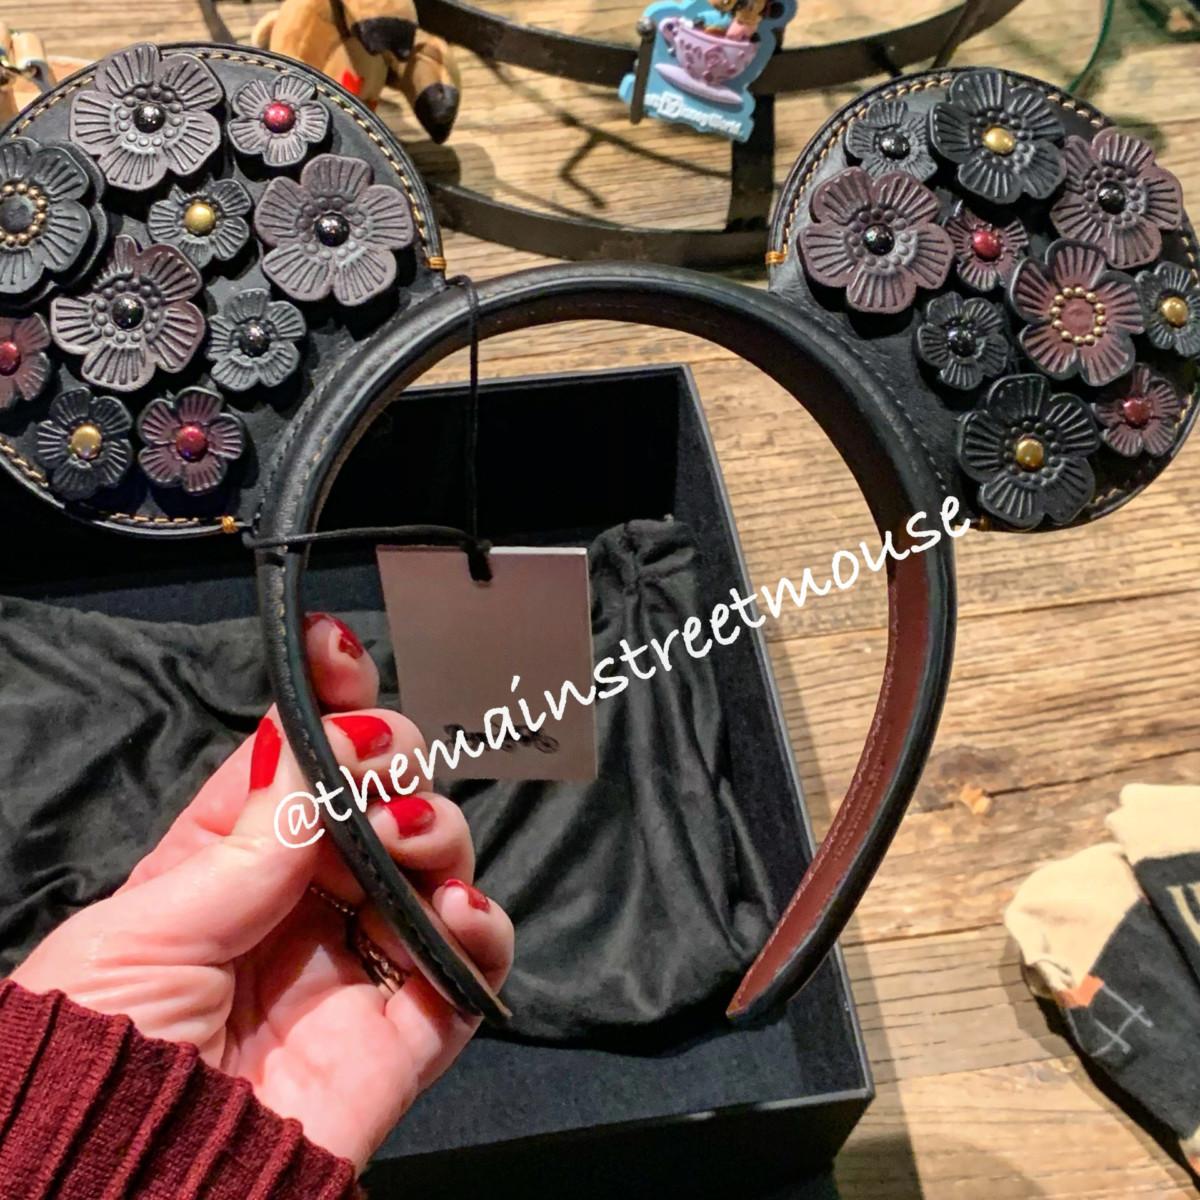 Sneak Preview of Upcoming Disney Merch! #disneyspringsholidays 12